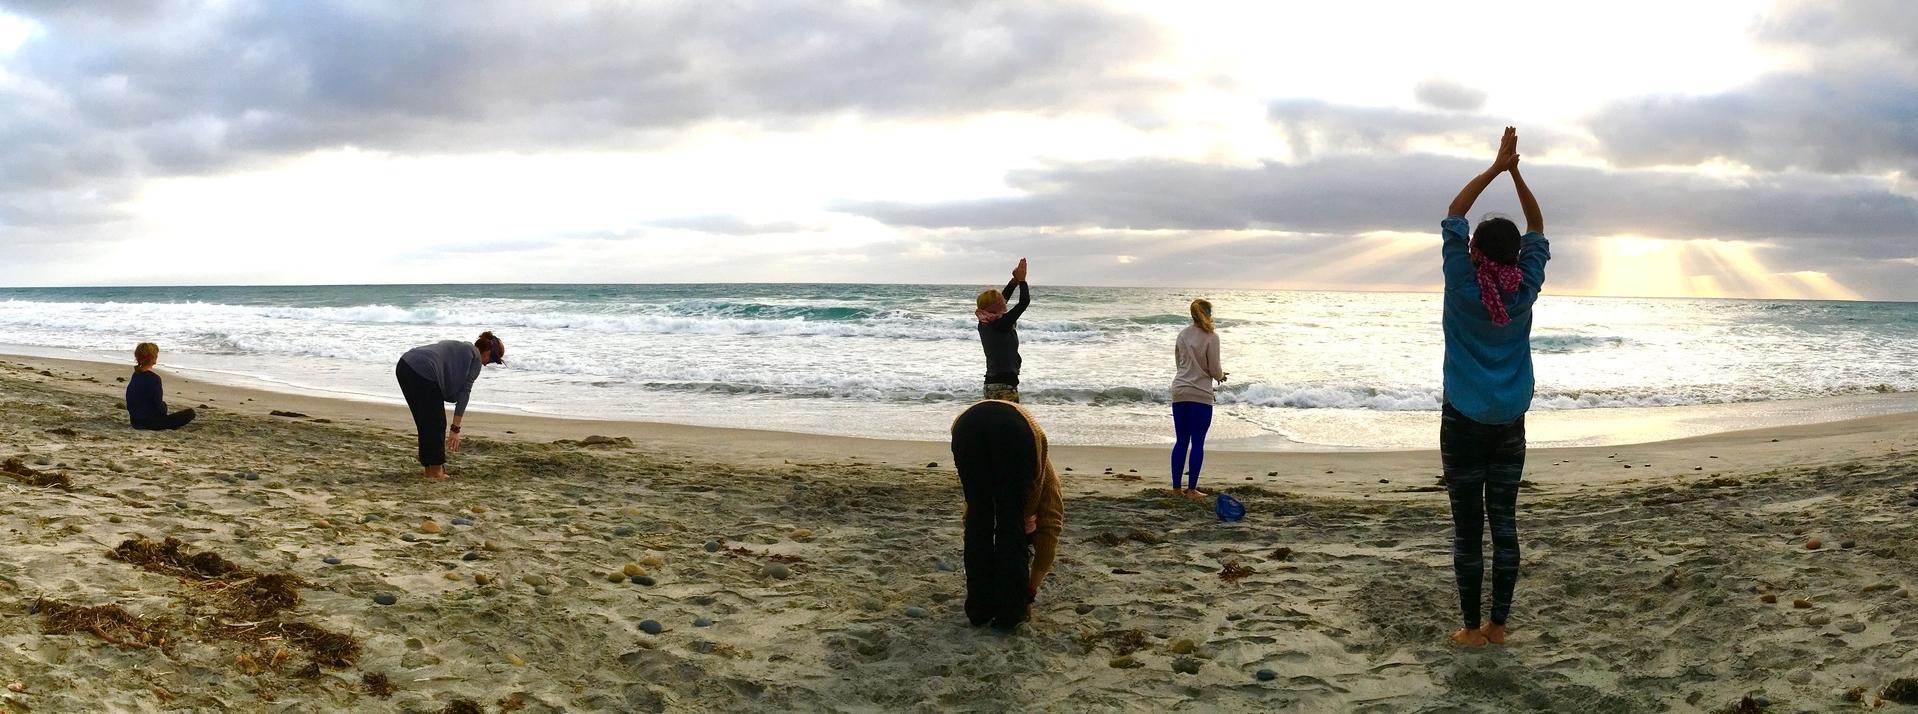 Beach group blindfold.jpeg